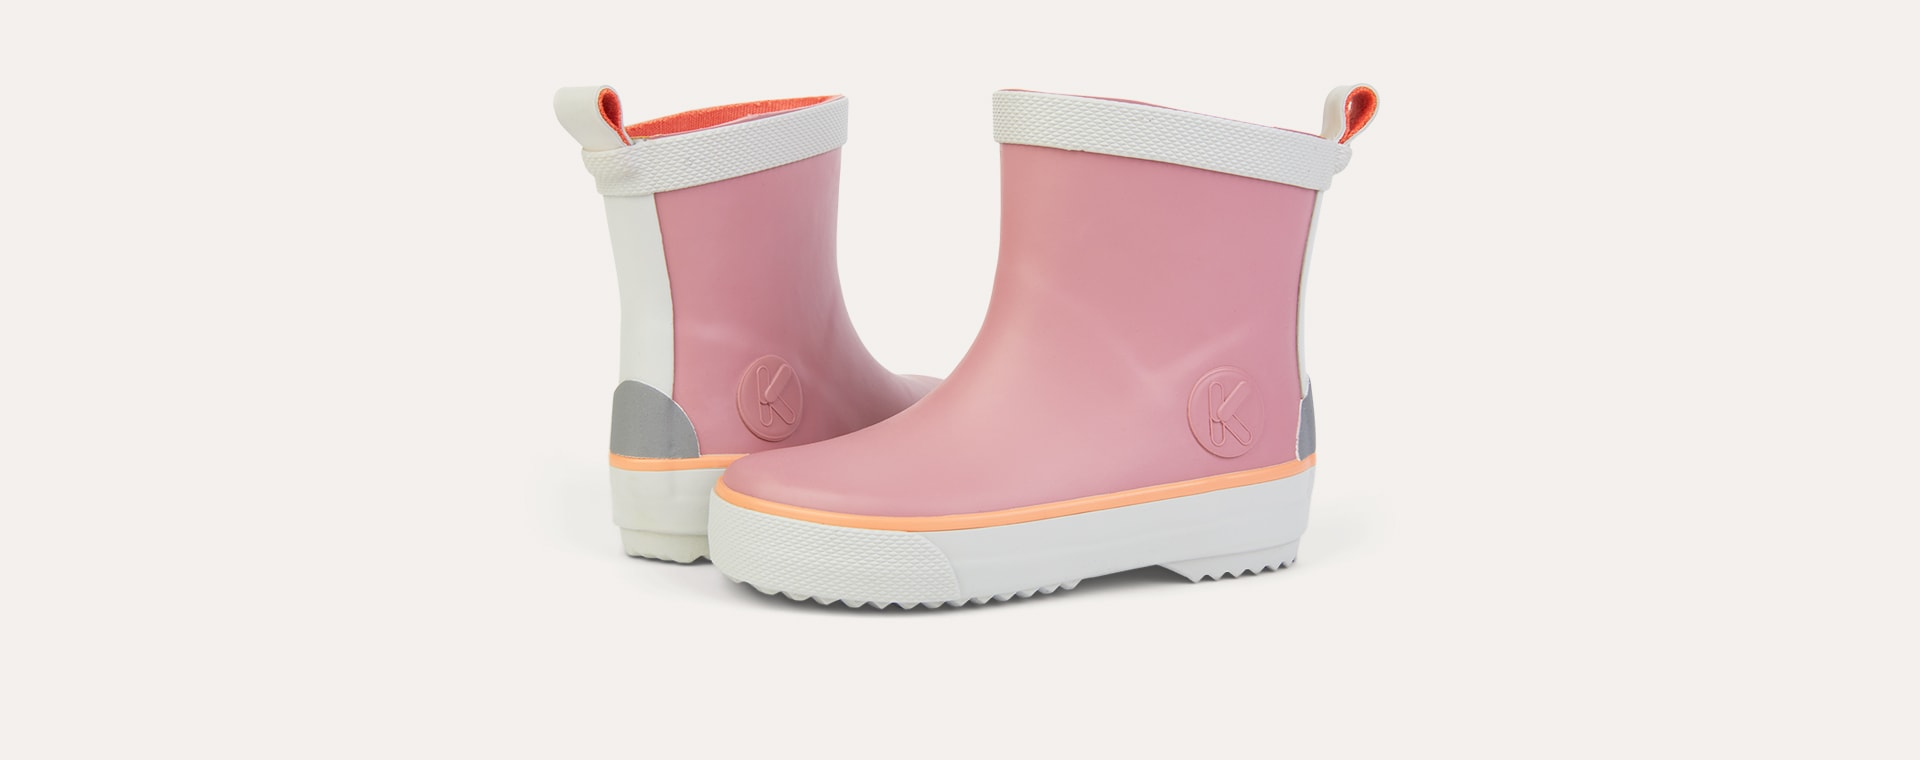 Rose KIDLY Label Short Rain Boot